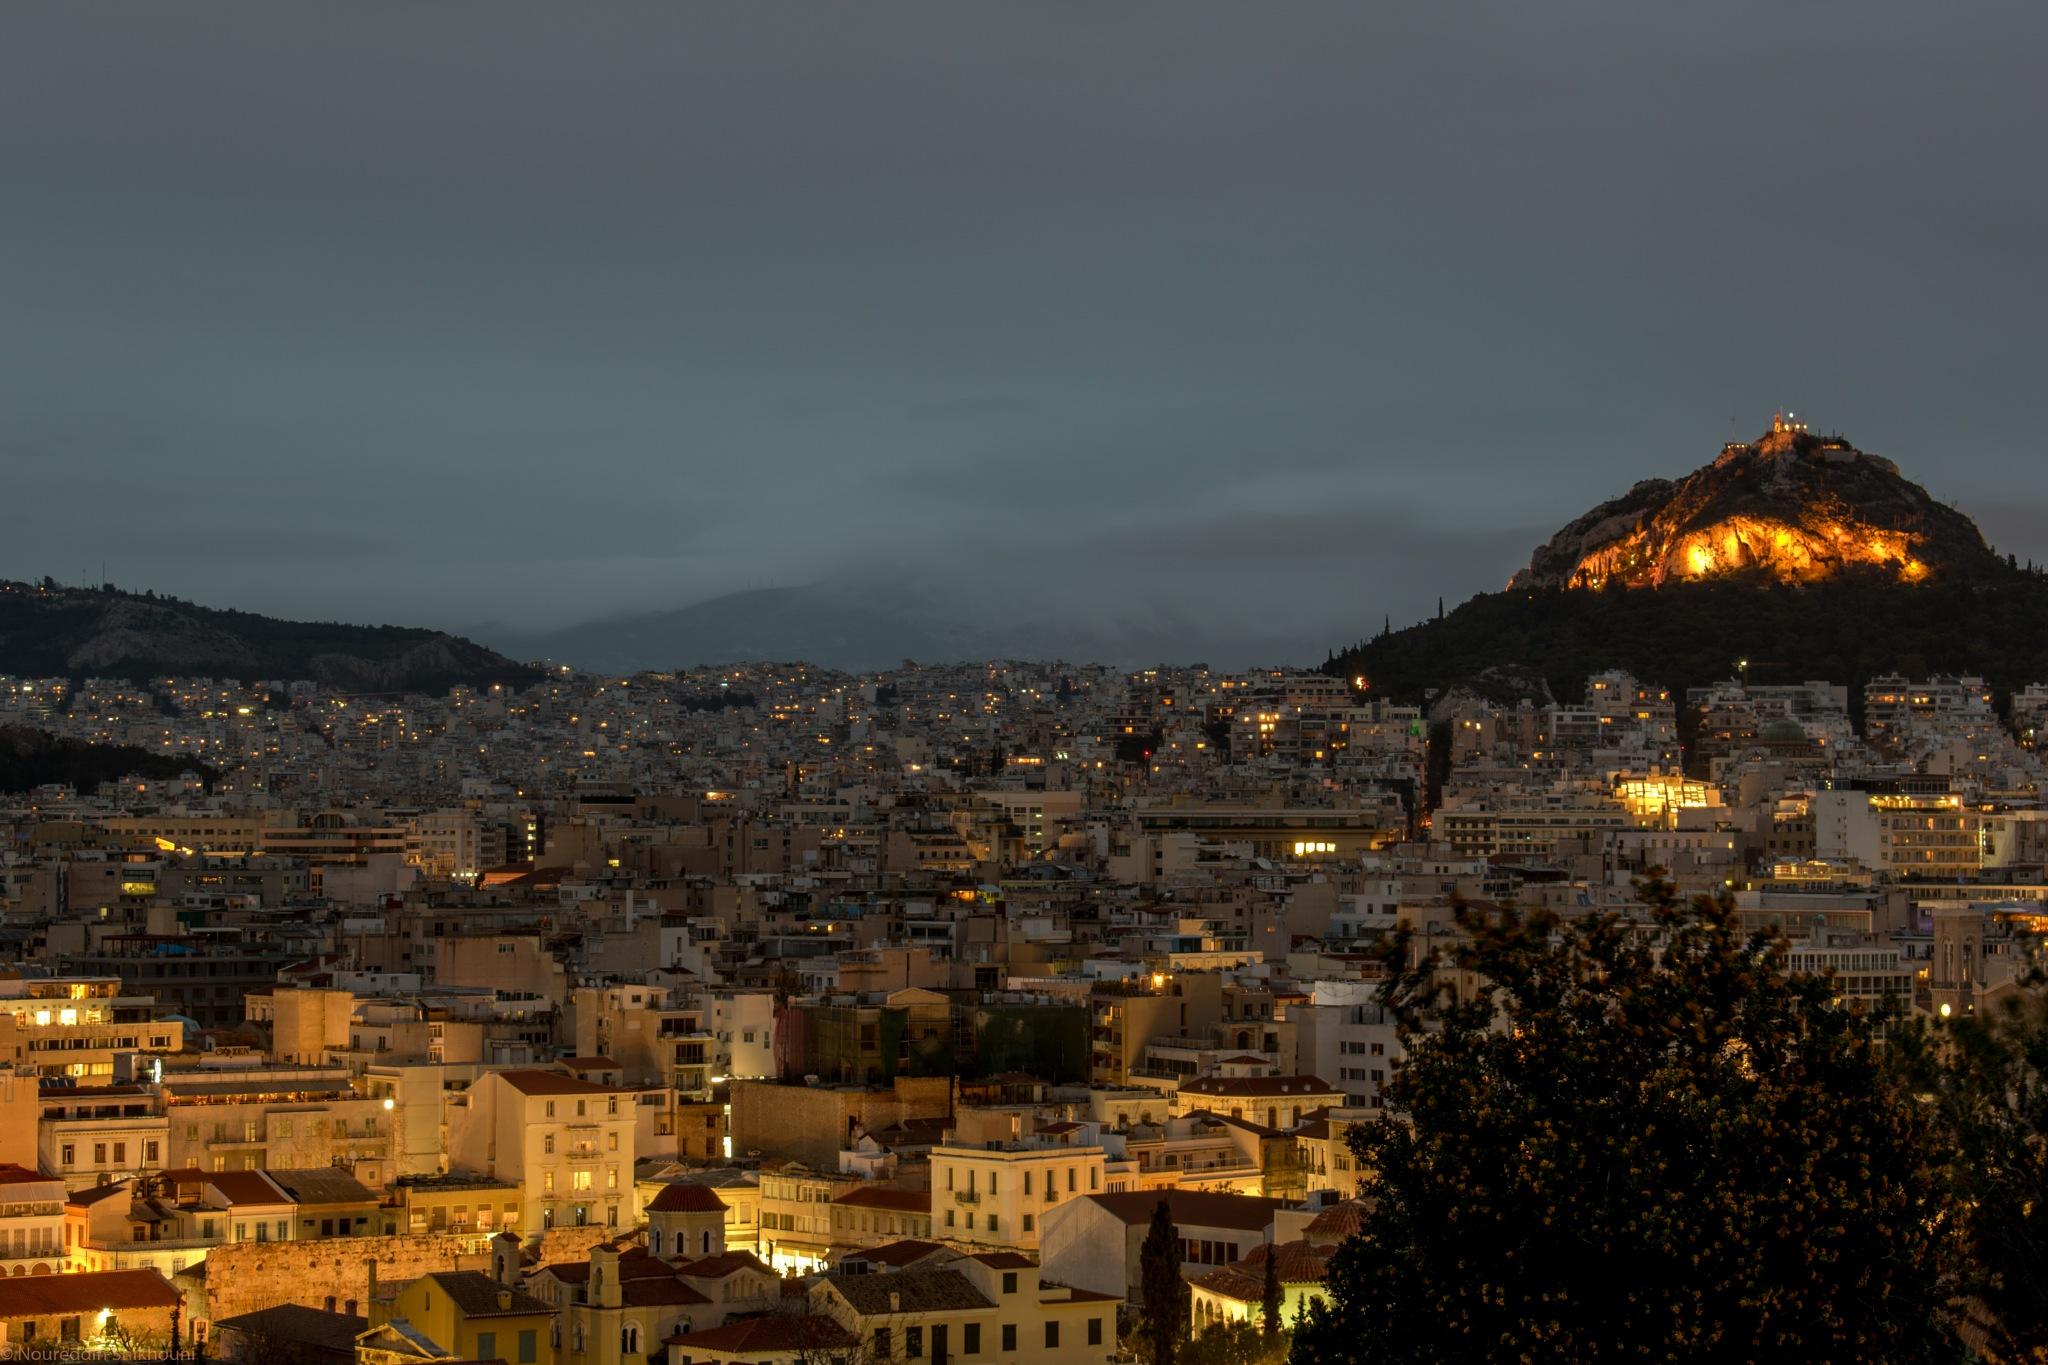 Athens By Night  by Nour-eddin Shikhuoni